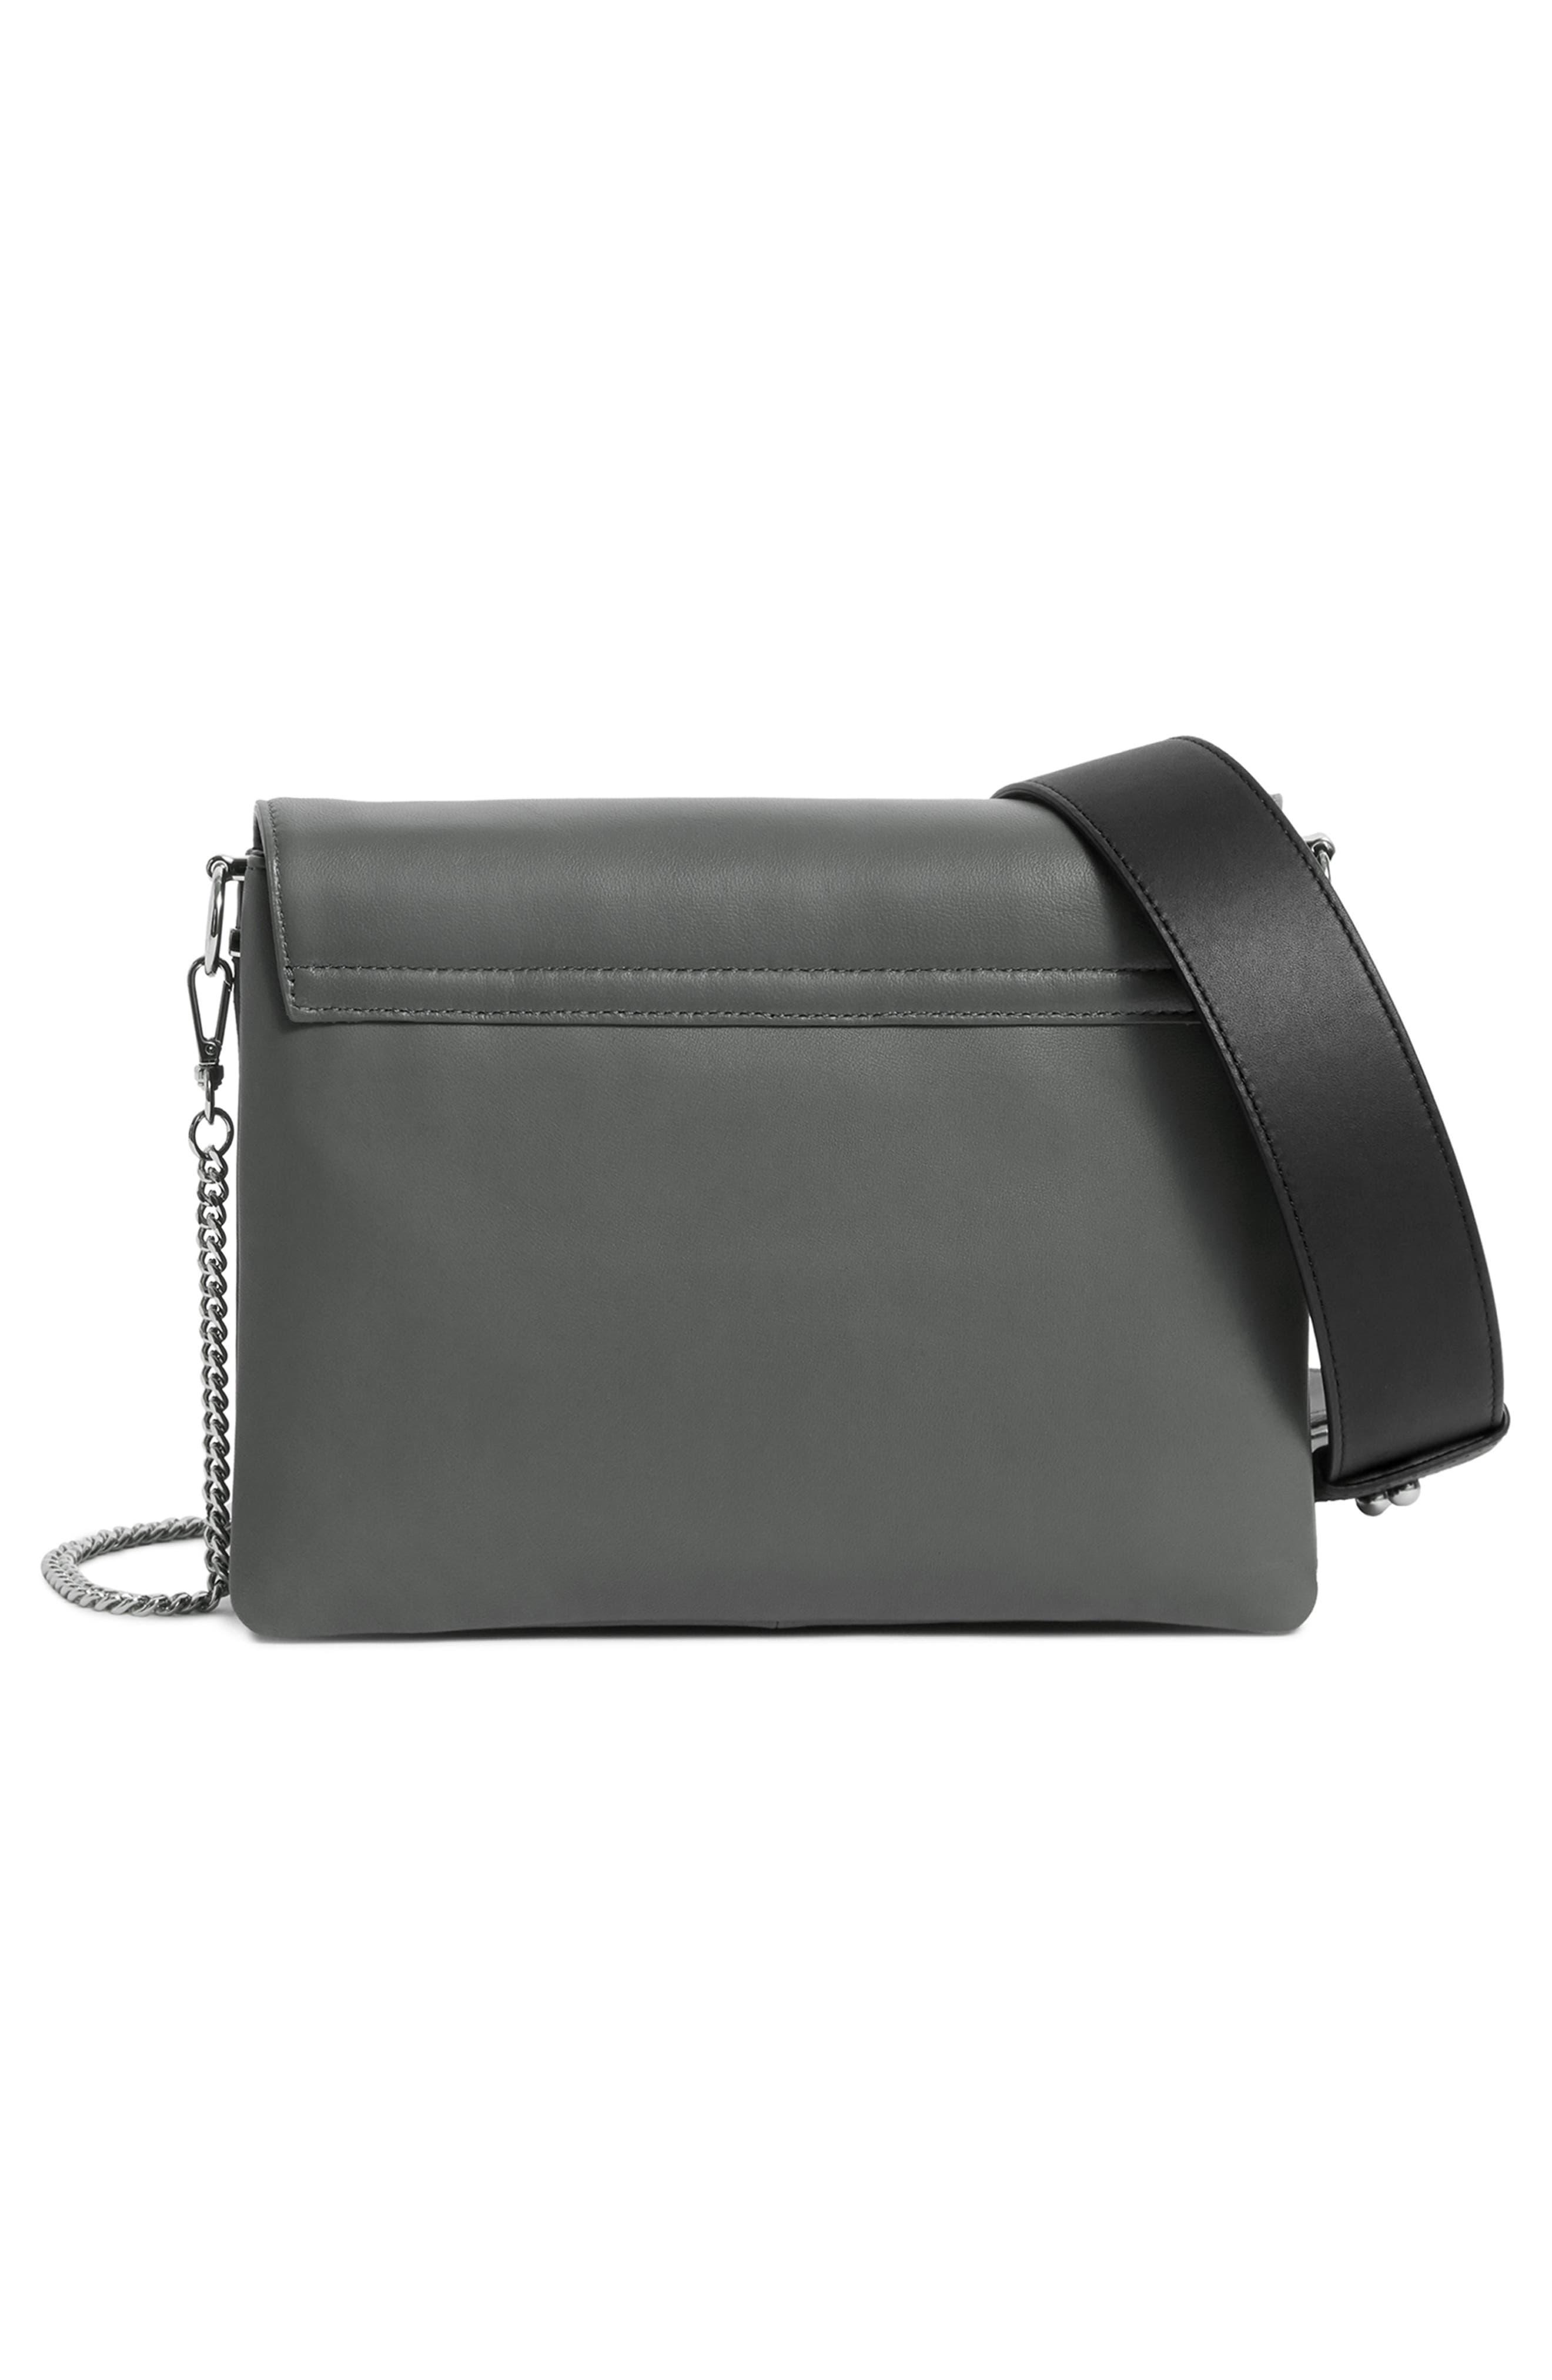 Zep Lambskin Leather Box Bag,                             Alternate thumbnail 4, color,                             SMOKY BLUE/ DARK BLUE